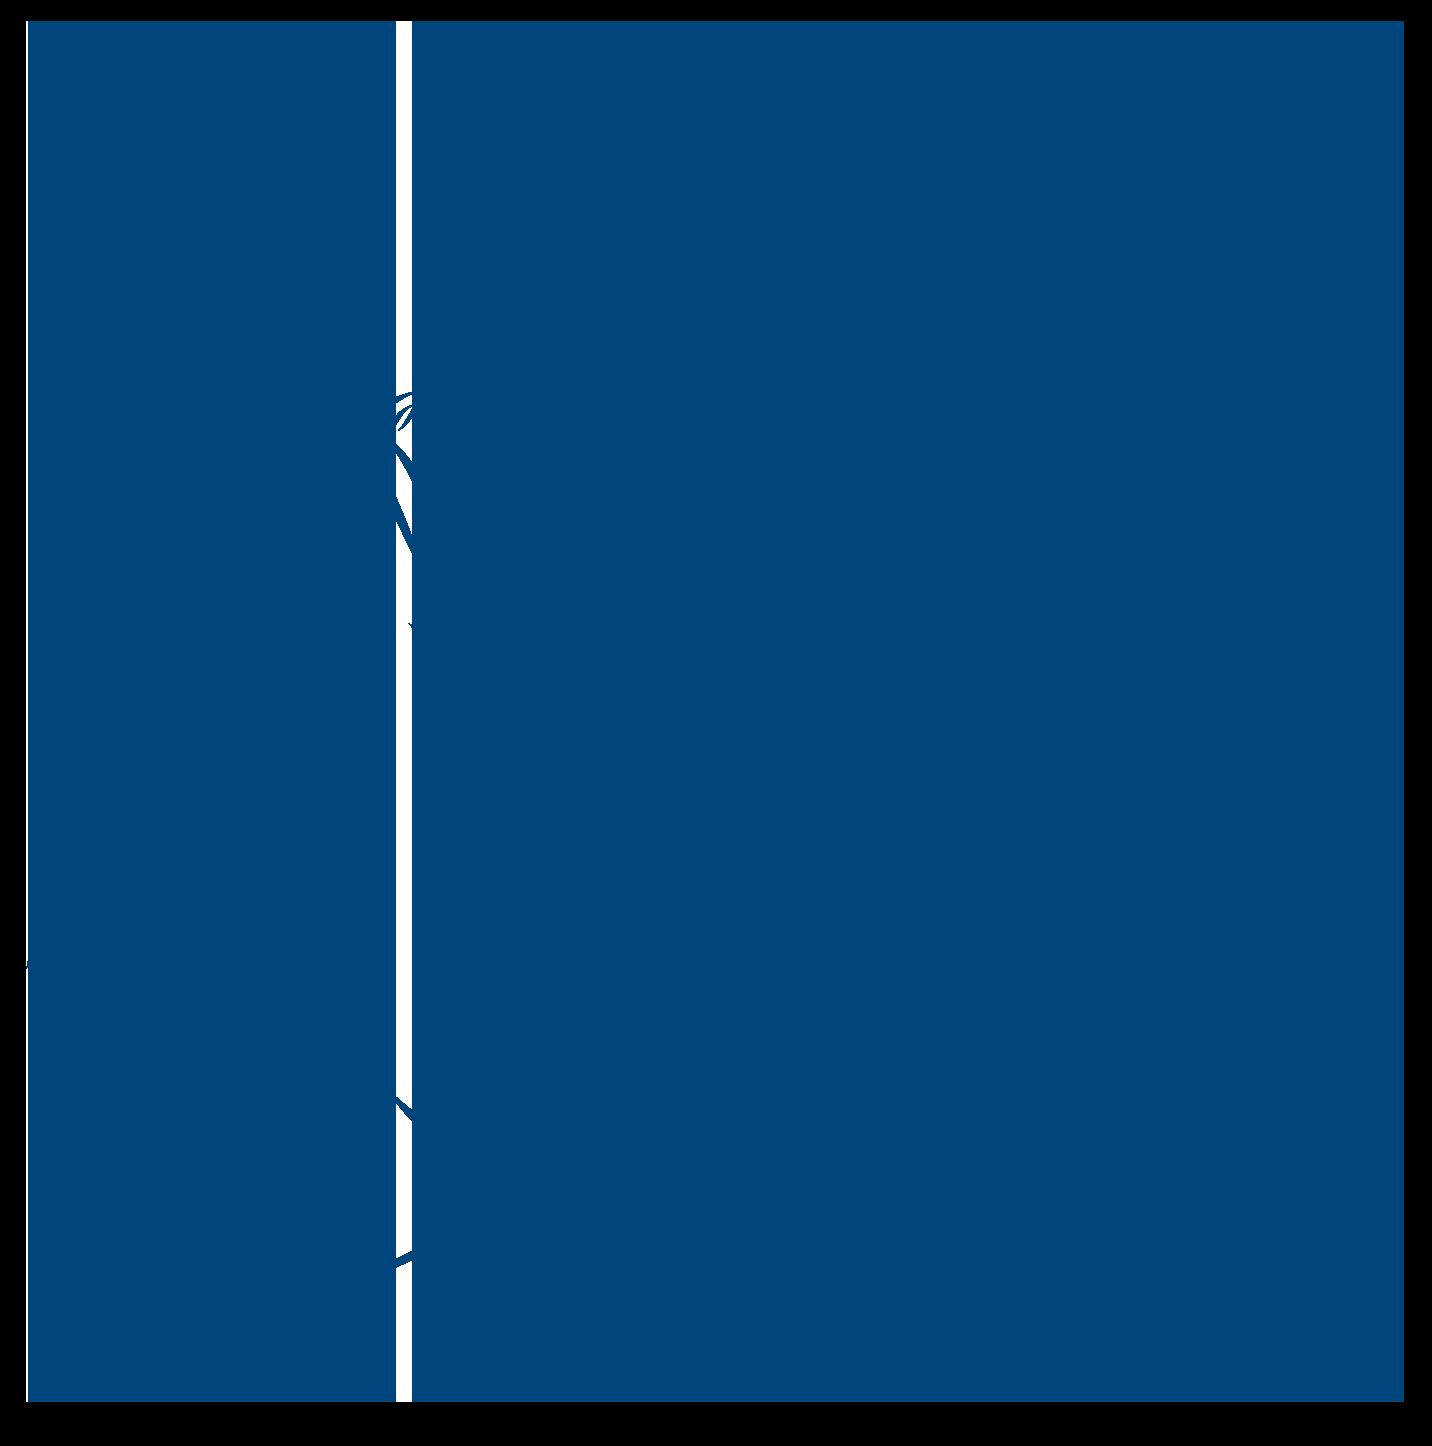 usability-probleme_identifizieren